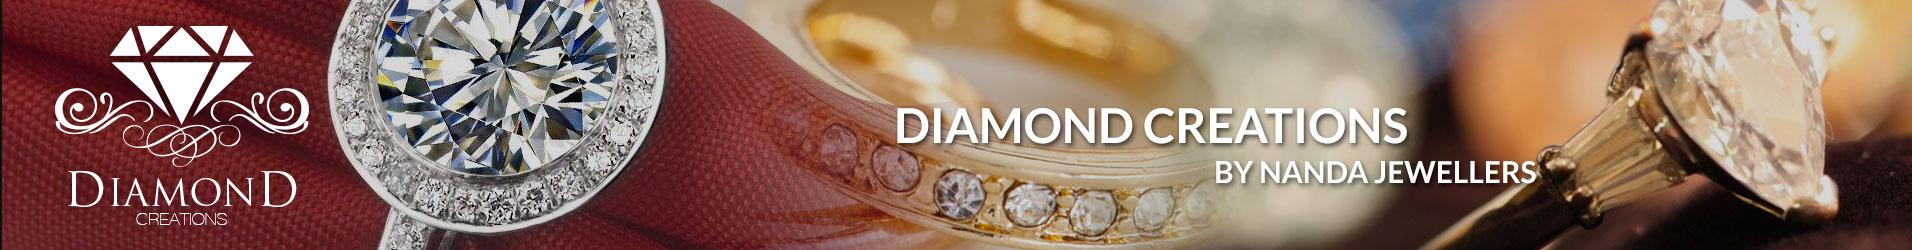 nanda_diamond_banner